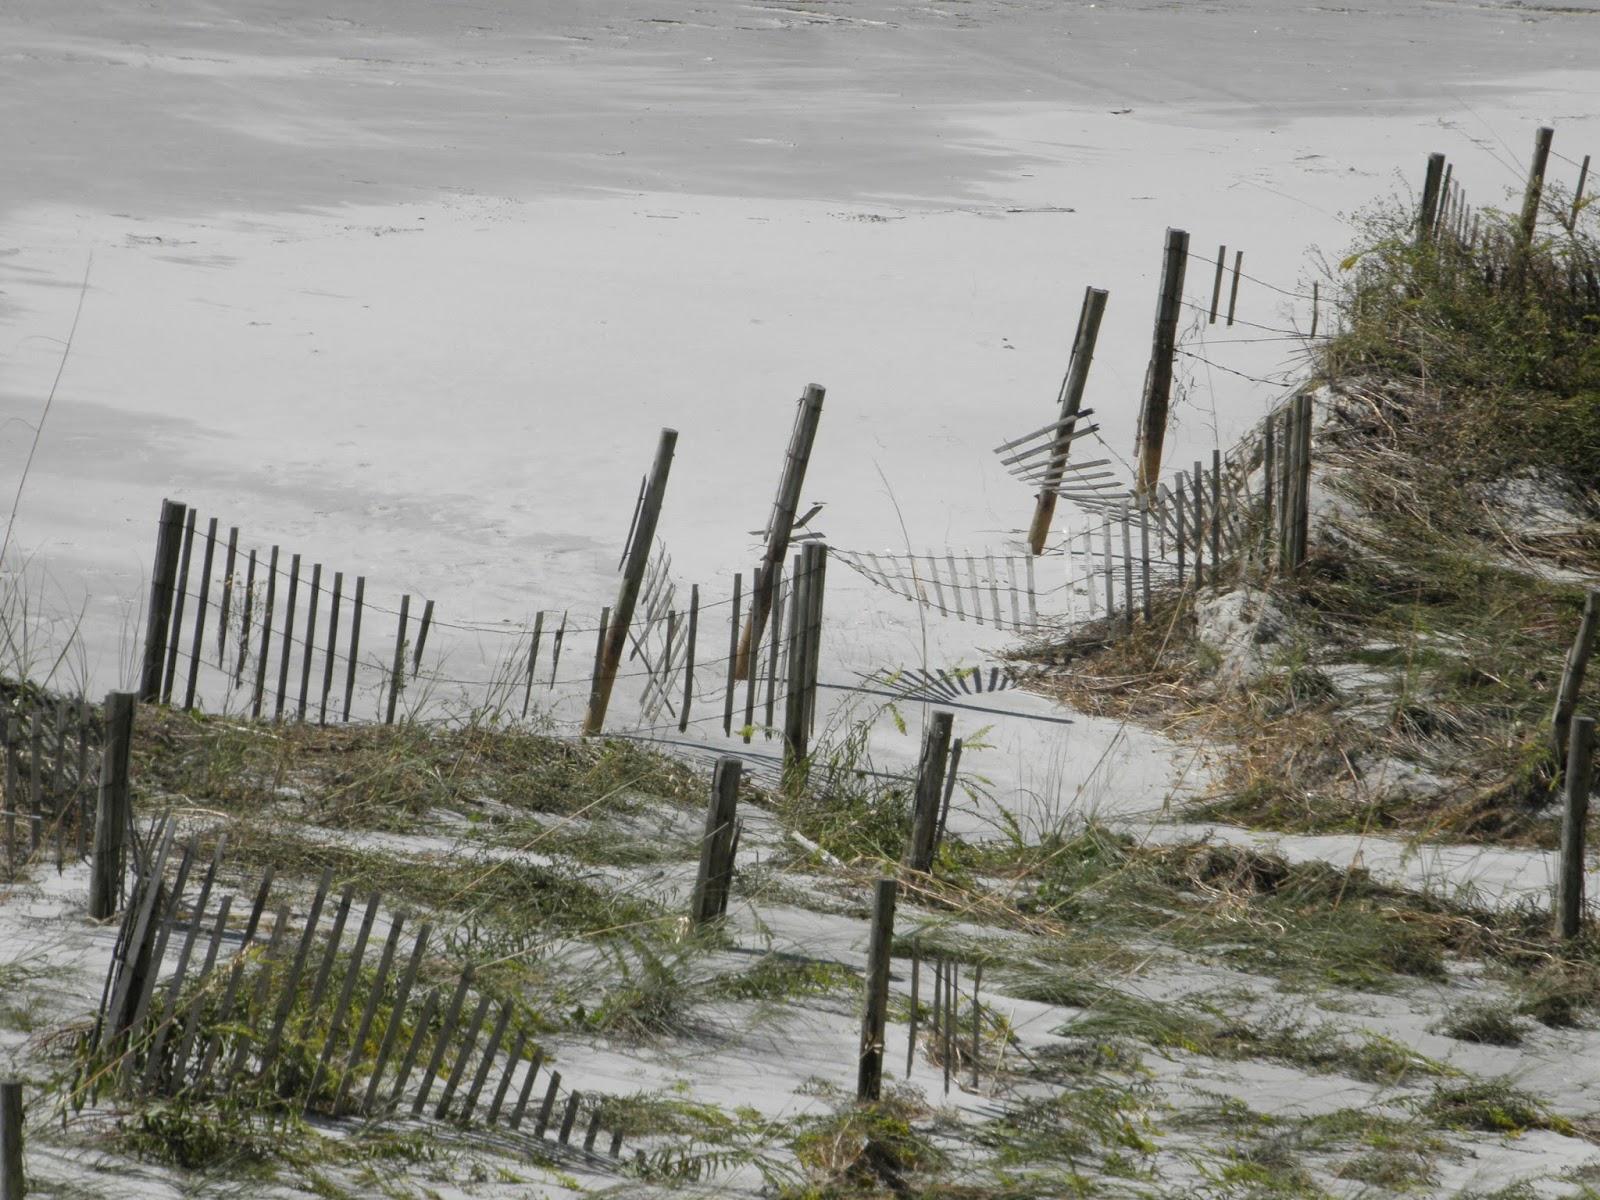 North Myrtle Beach Sea Turtle Patrol